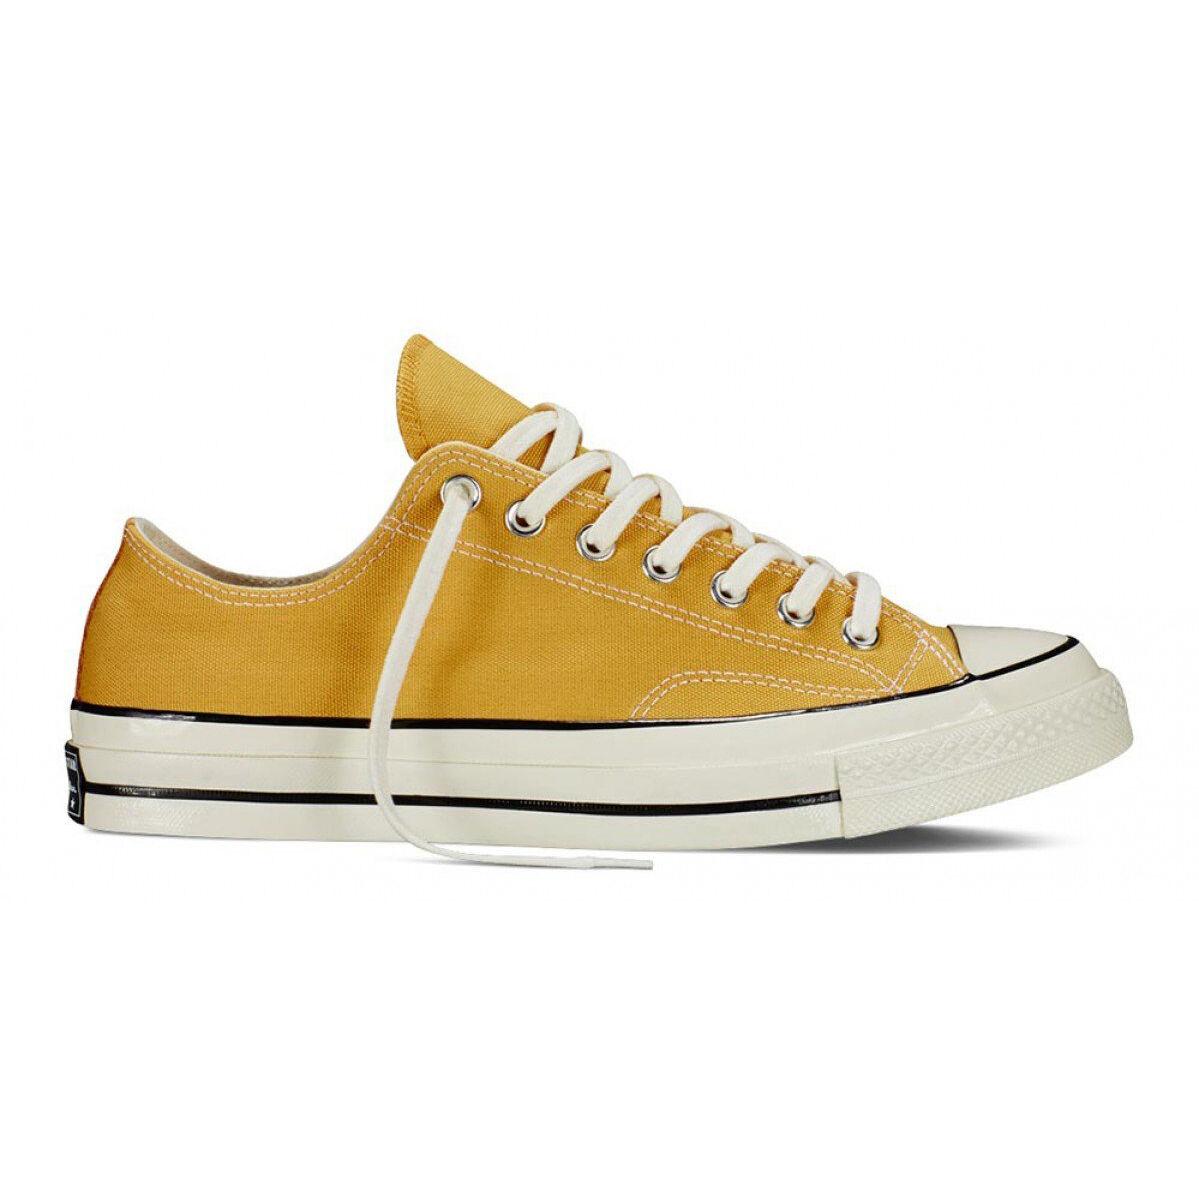 de4481878b6a Converse Chuck Taylor All Star Low 1970s Sunflower Yellow First String  151229C